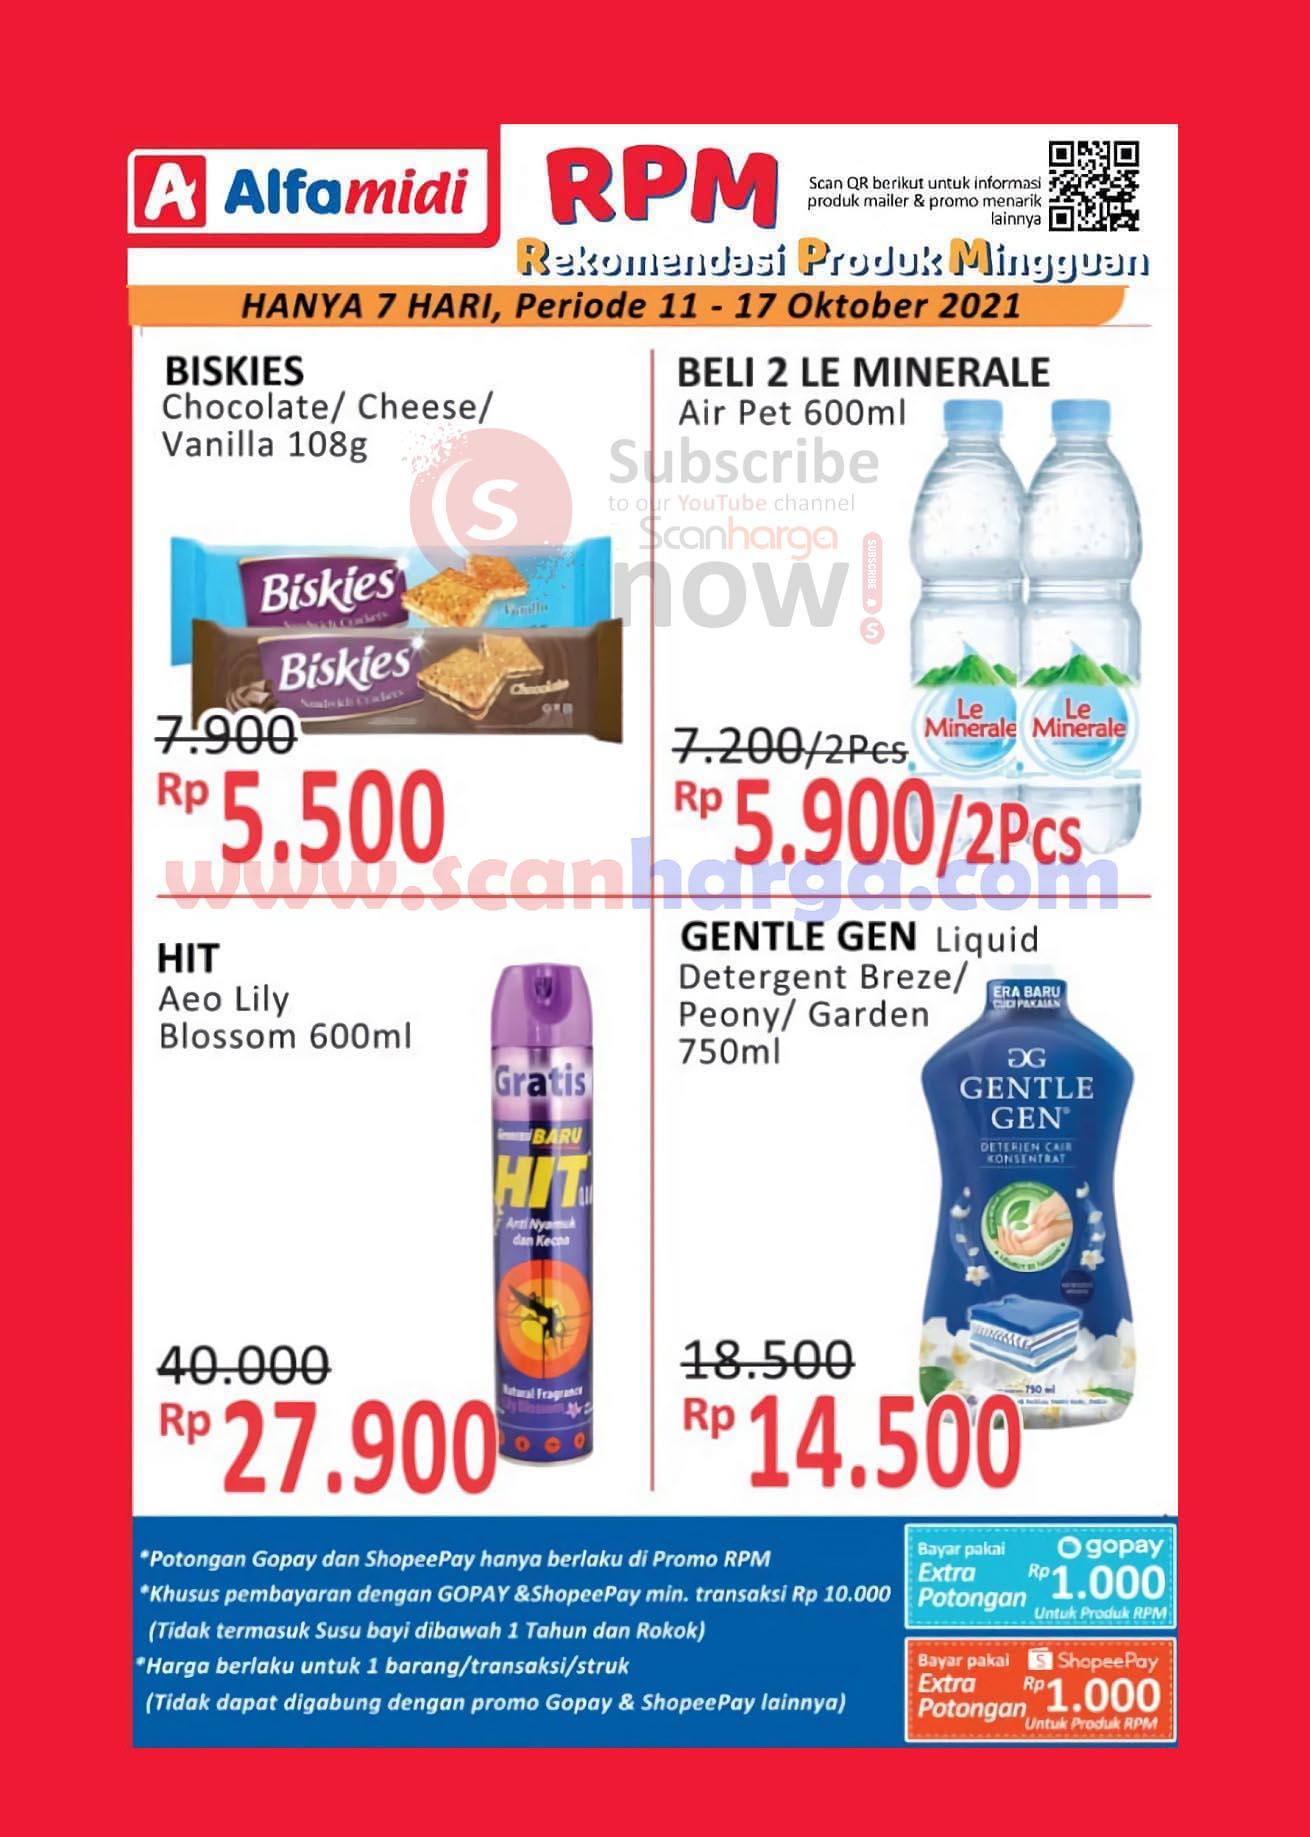 Katalog Promo RPM Alfamidi 11 - 17 Oktober 2021